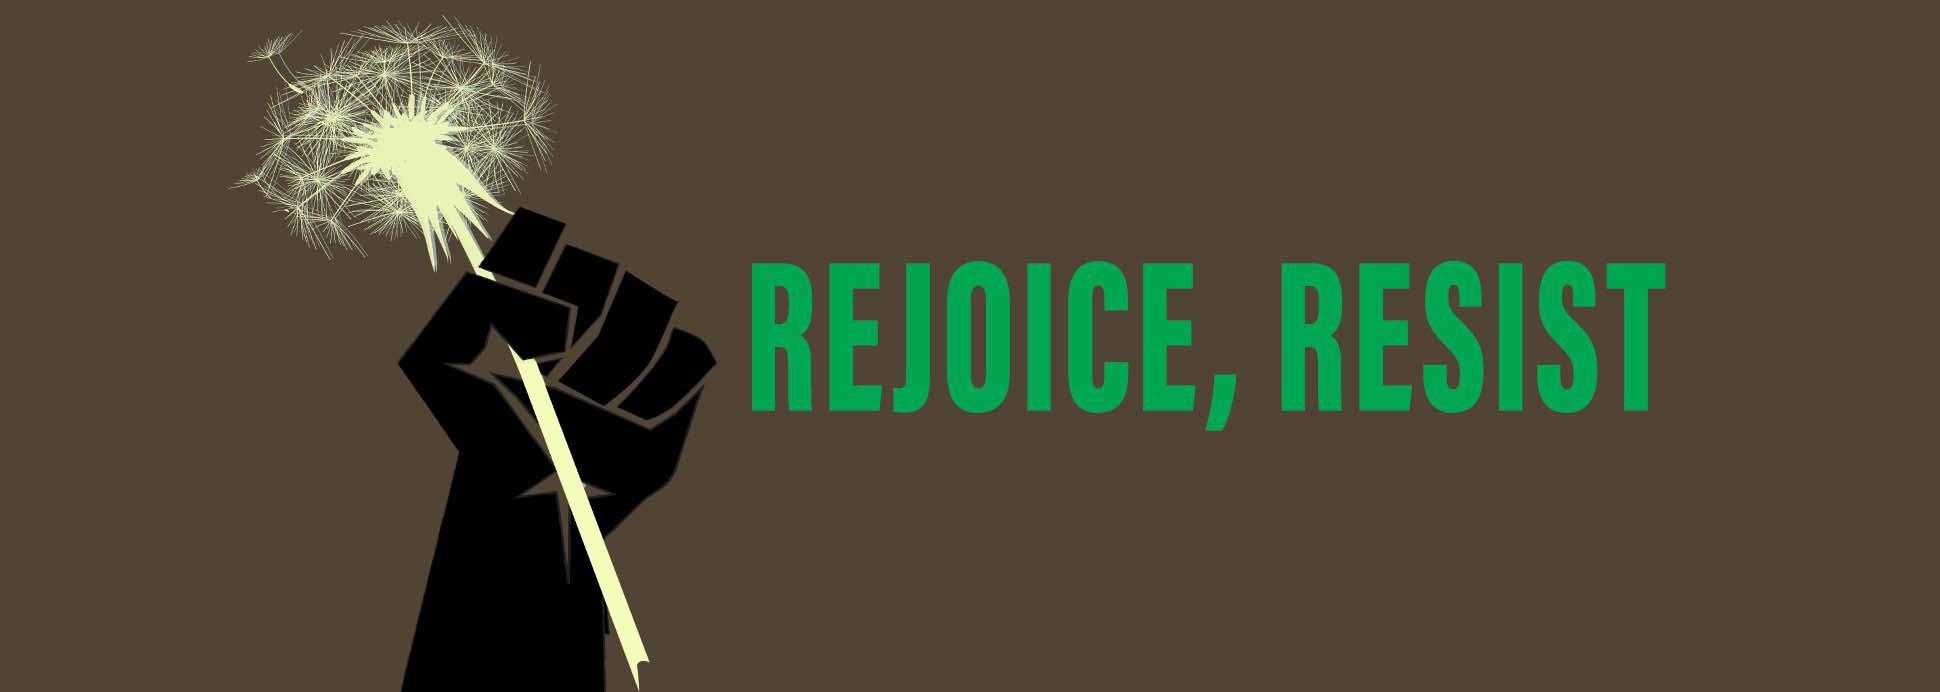 Rejoice, Resist